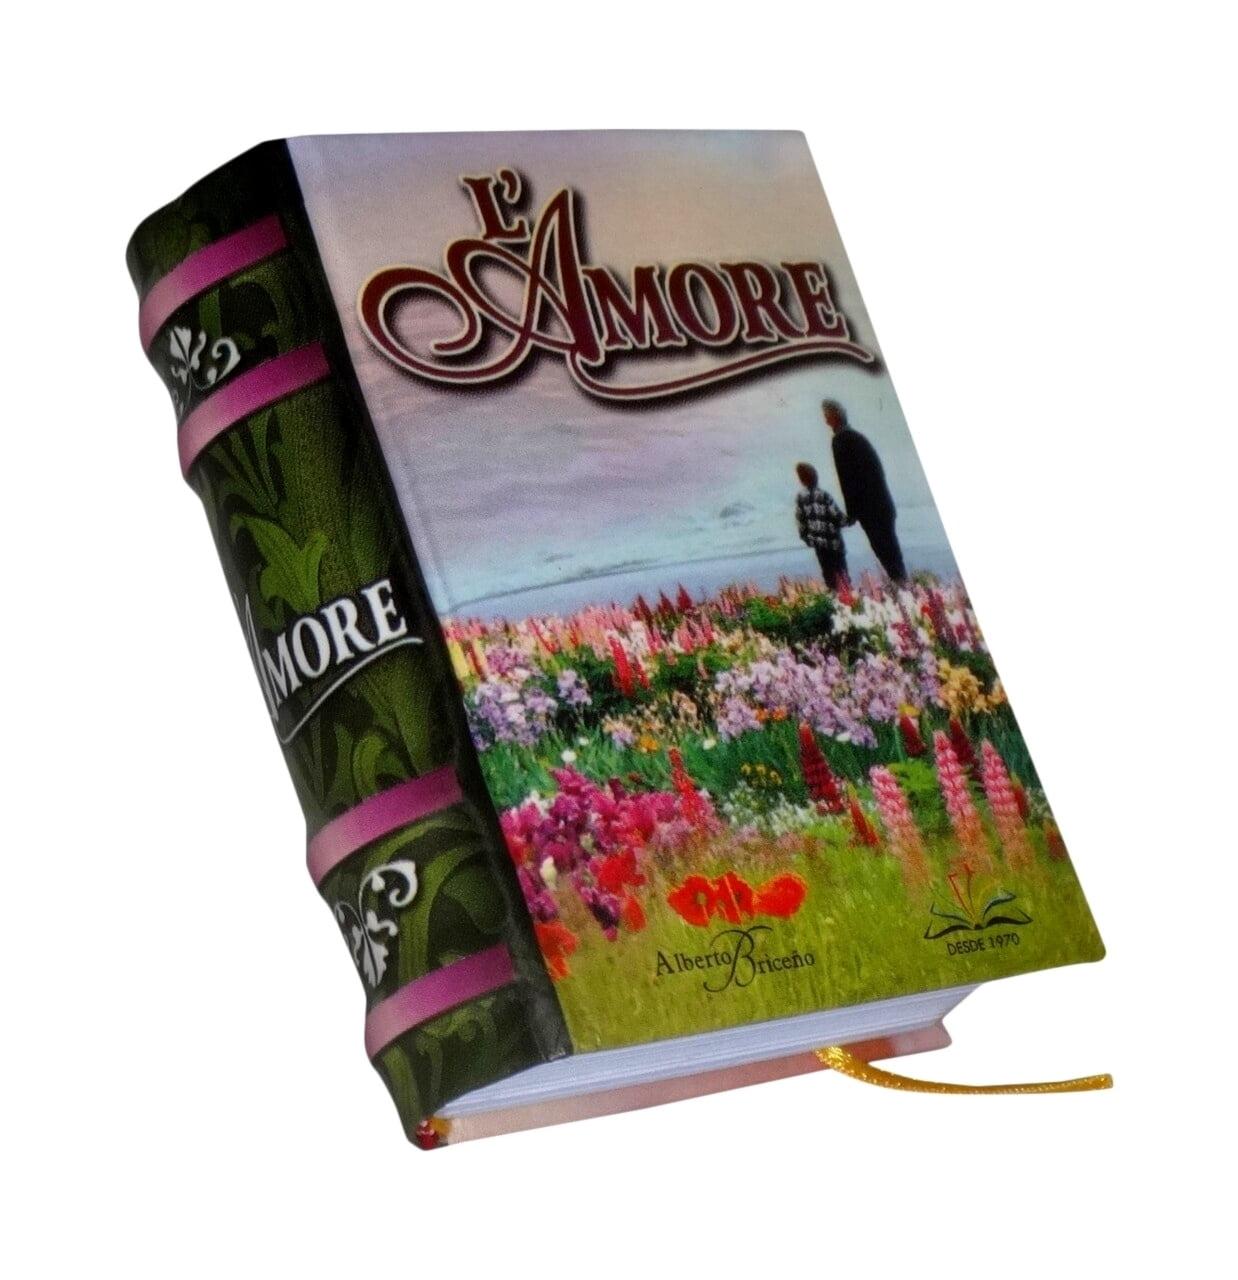 Amore-miniature-book-libro